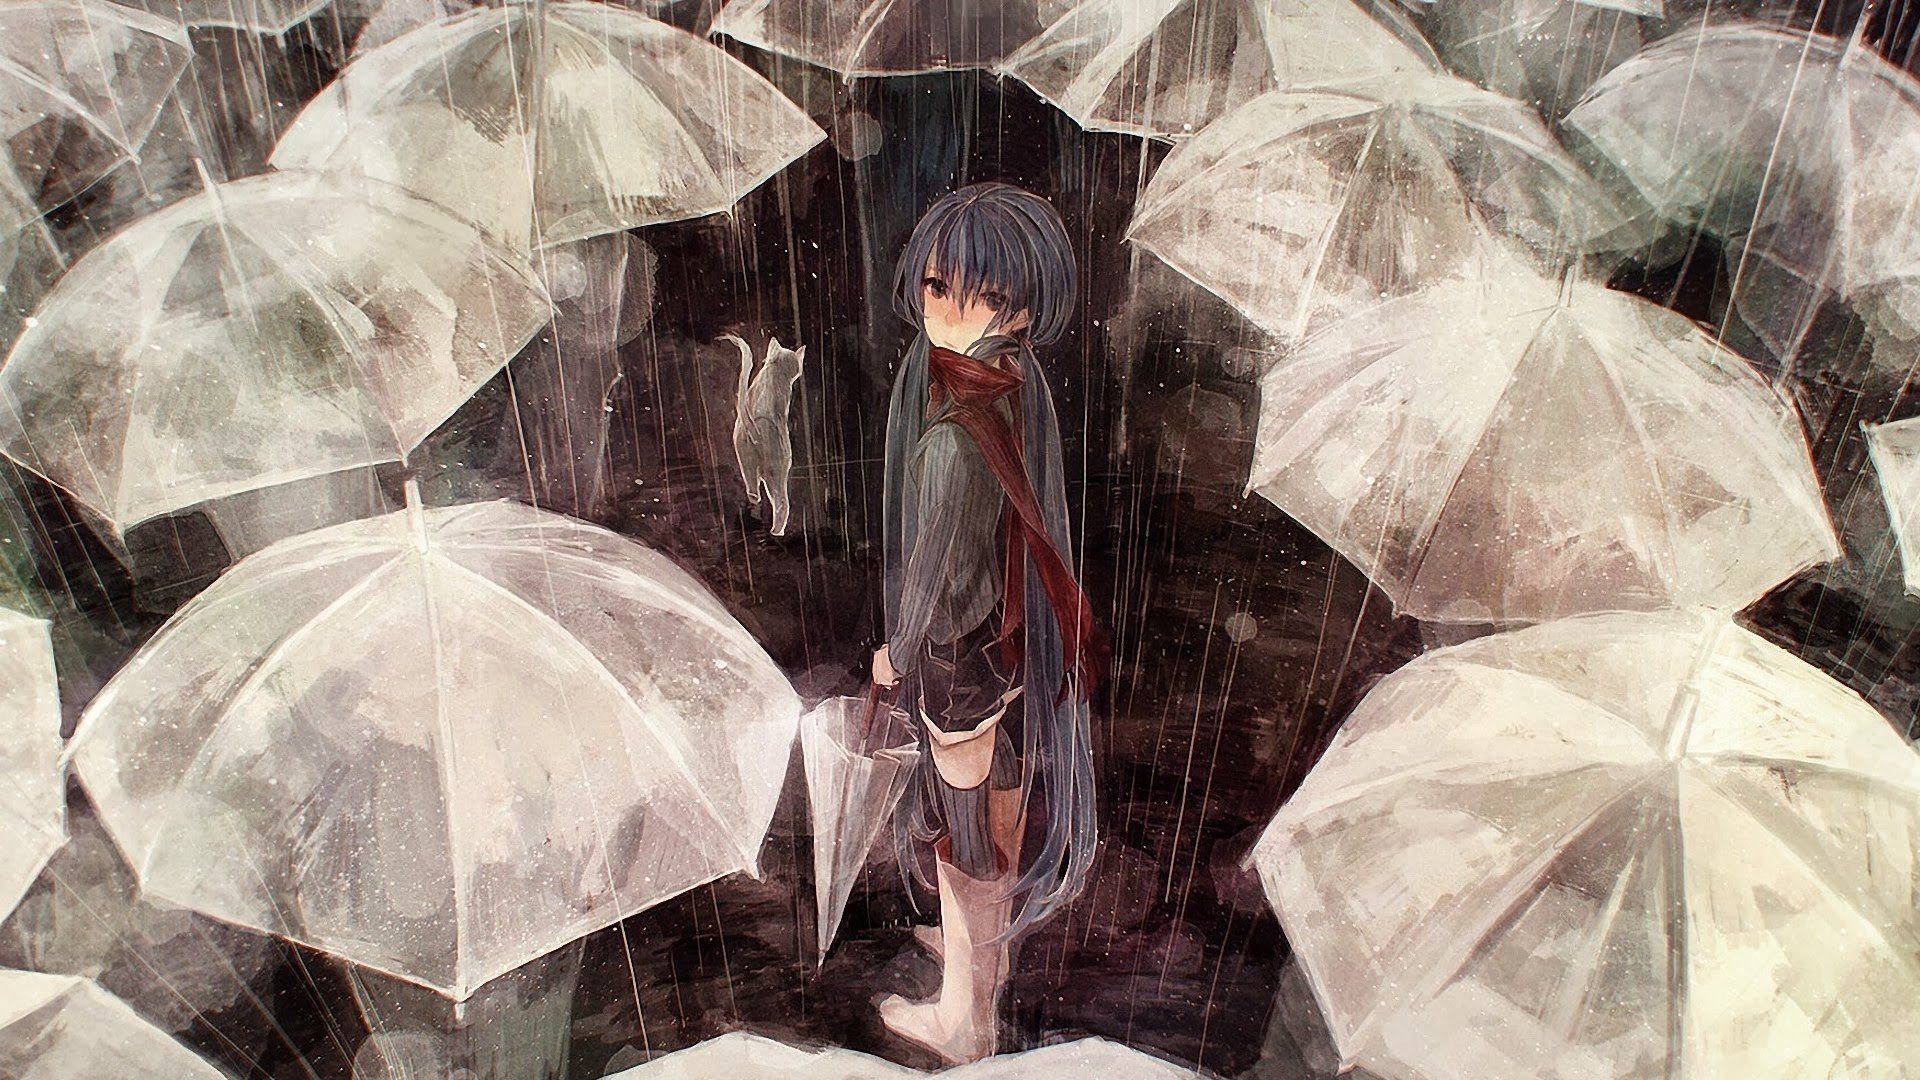 5760x1080 Wallpaper Girl Anime Girls Umbrella Rain Vocaloid Hatsune Miku Hd